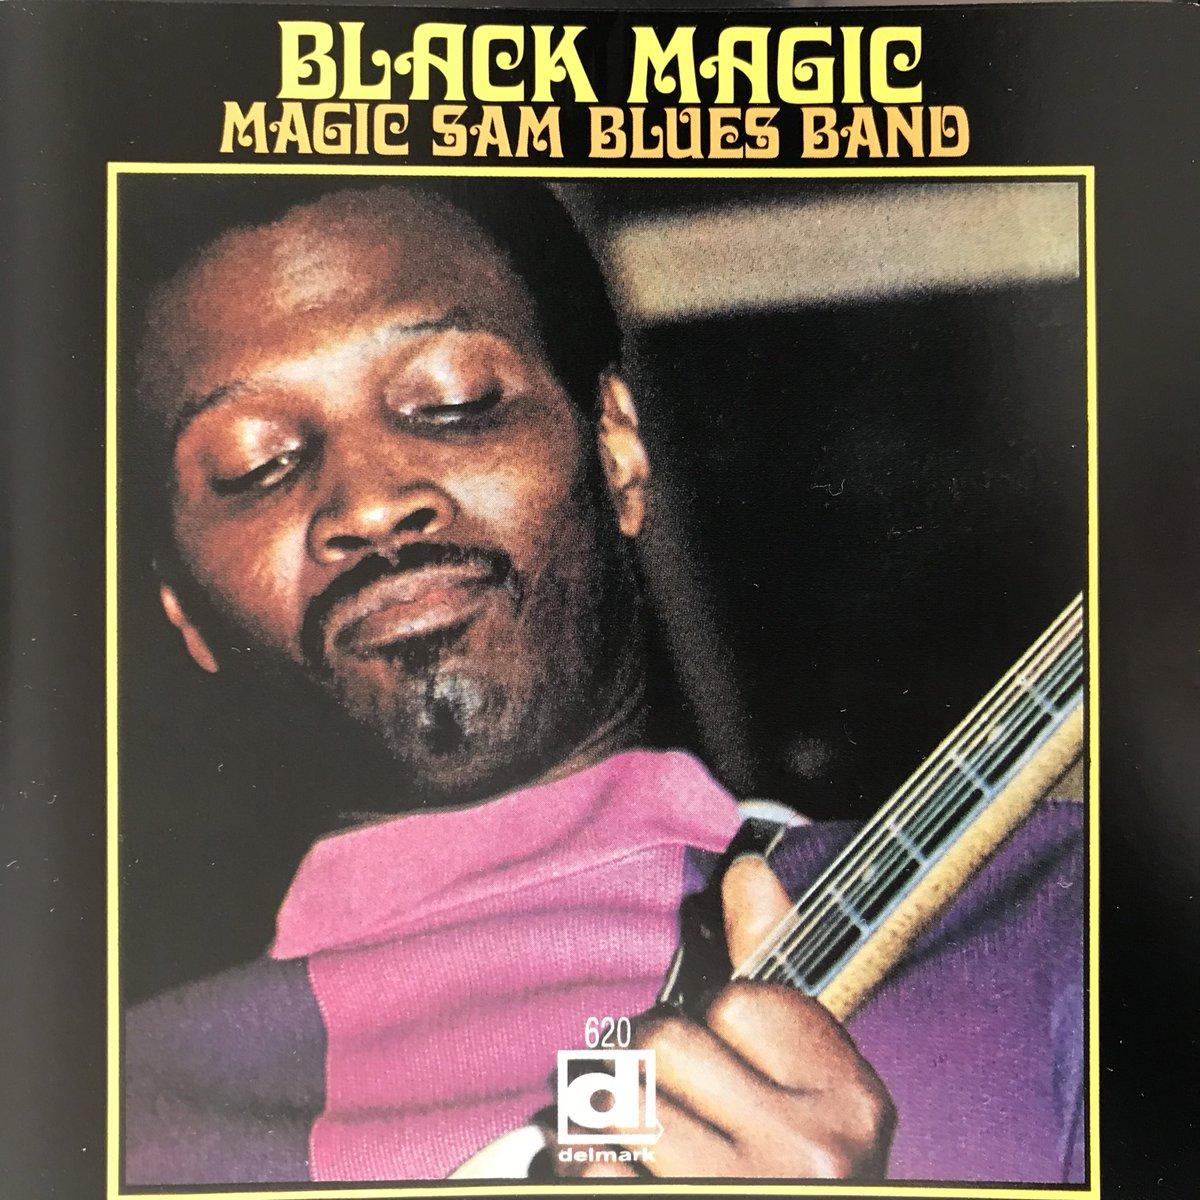 this Week Recommend2️⃣MAGIC SAM BLUES BAND Black Magic 1994  #blues #chicagoblues #deltablues  #soulblues #ブルース https://t.co/ZiQ5Bu8sV9